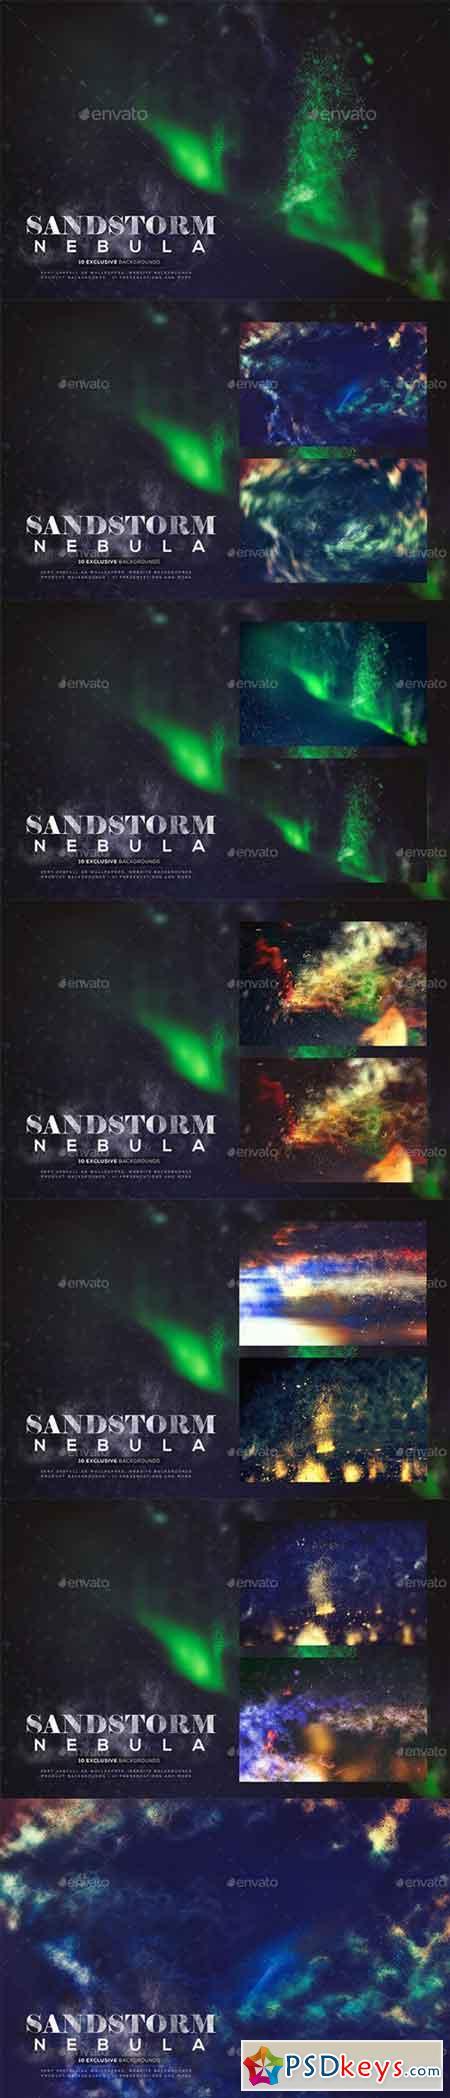 Abstract Sandstorm Nebula Backgrounds 19977223